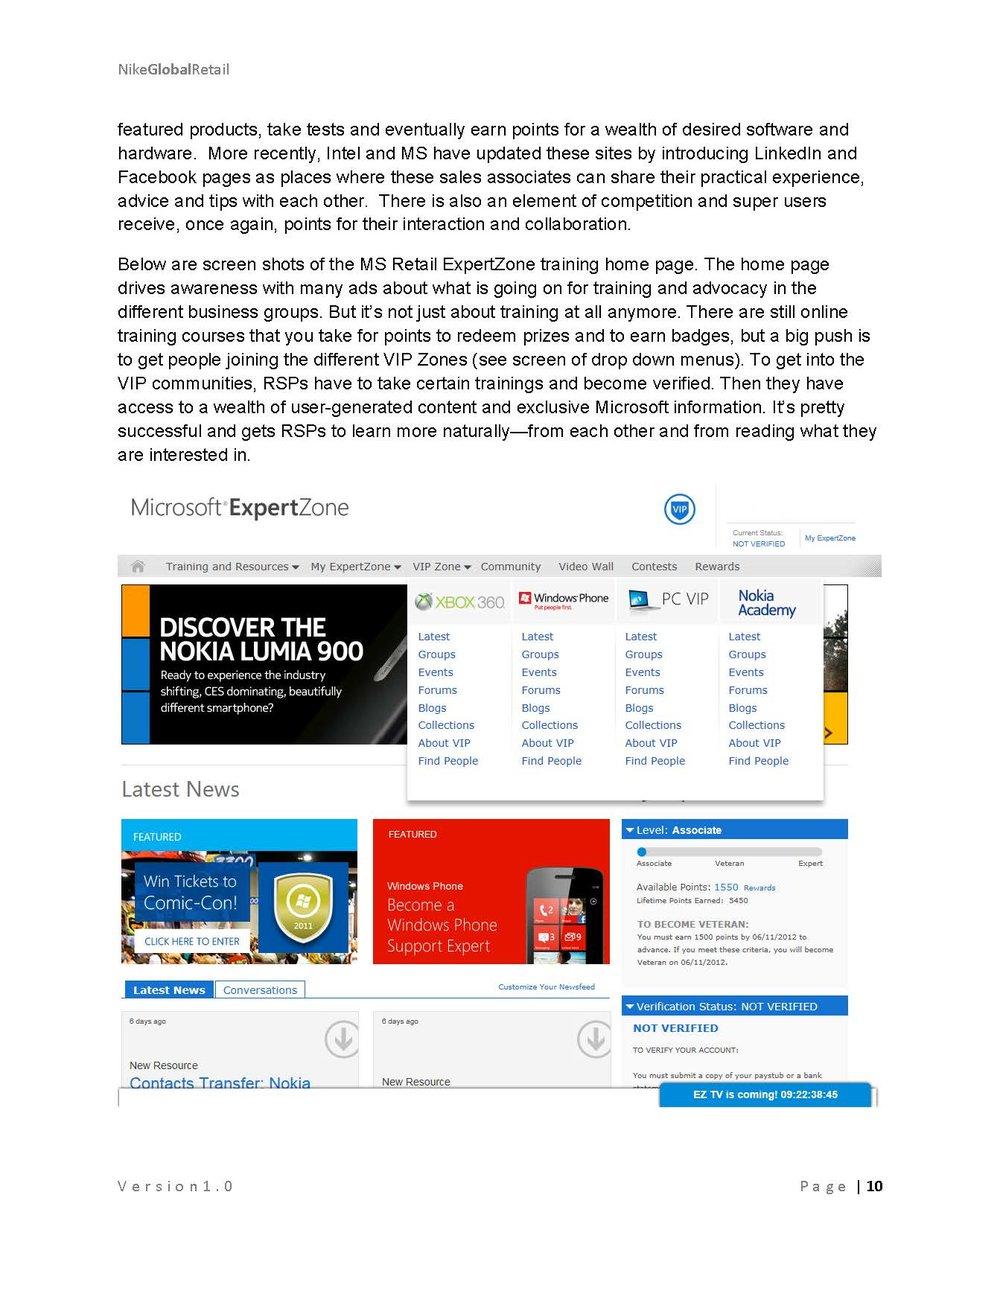 SG_3_Page_10.jpg